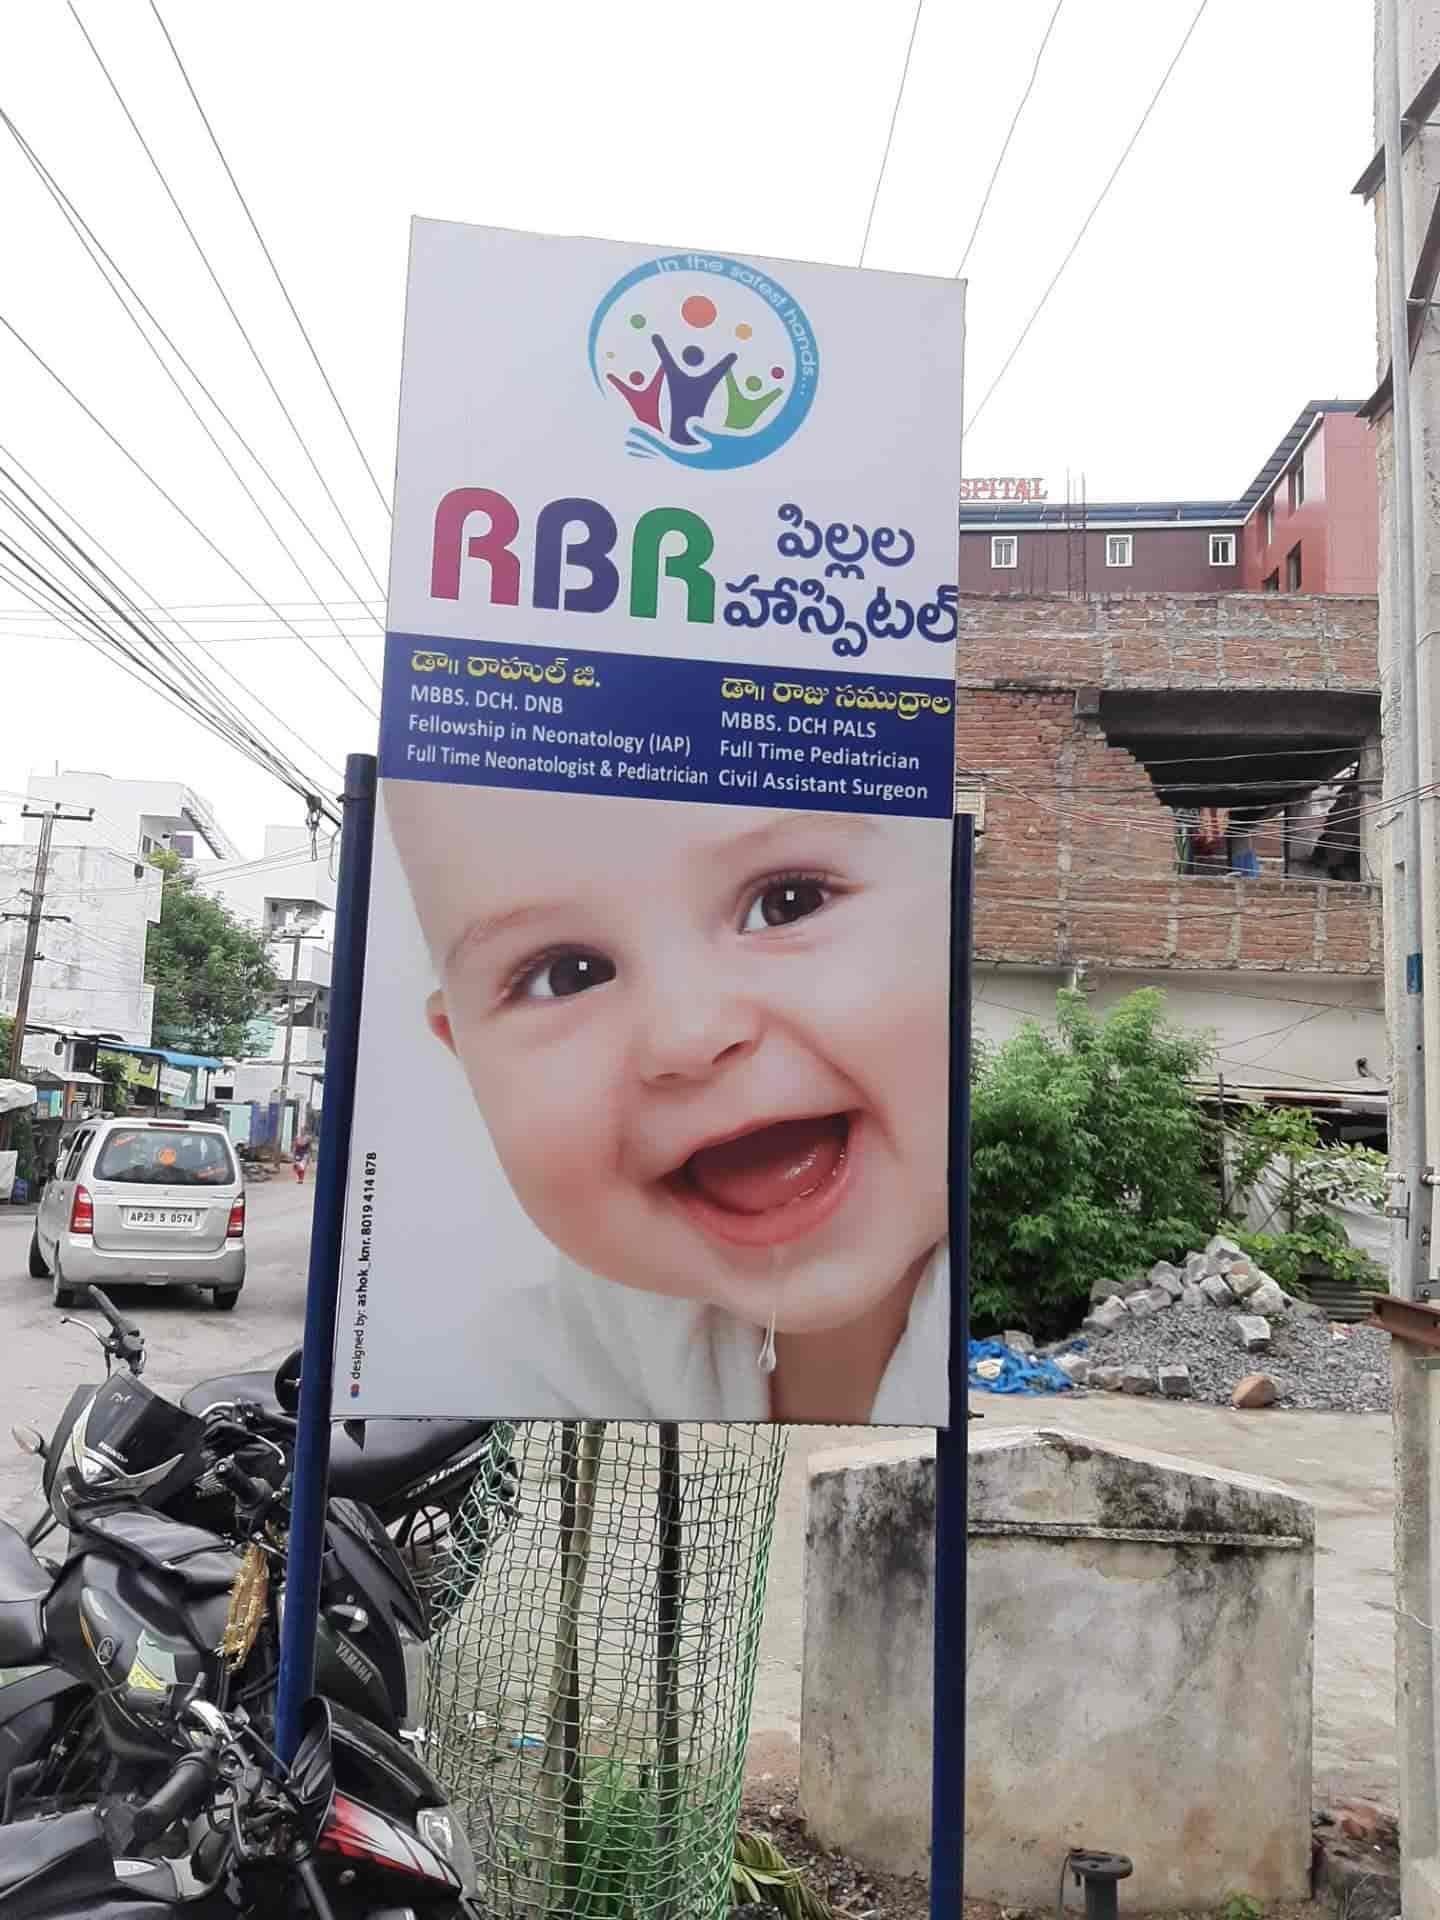 Rbr Children Hospital, Mancherial Chowrasta - Hospitals in